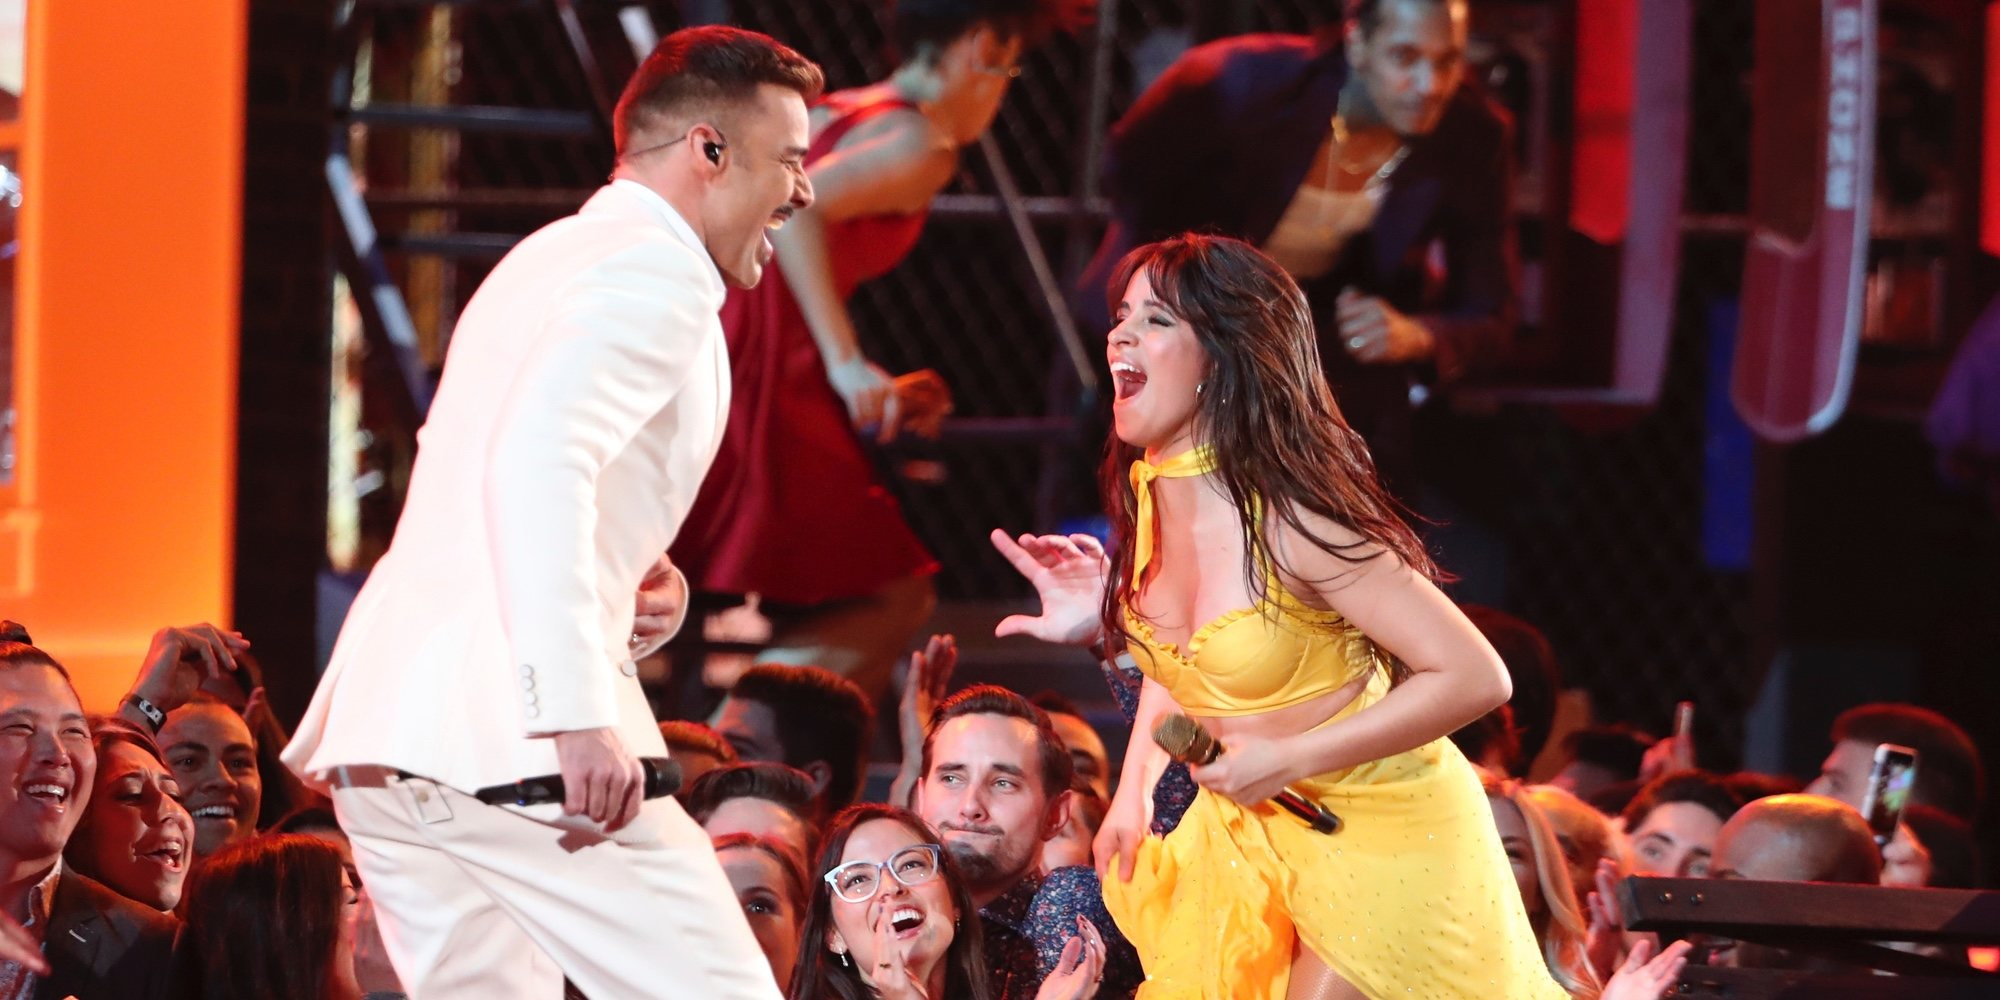 Ricky Martin revolucionó la alfombra roja de los Grammy 2019 junto a su hijo Matteo